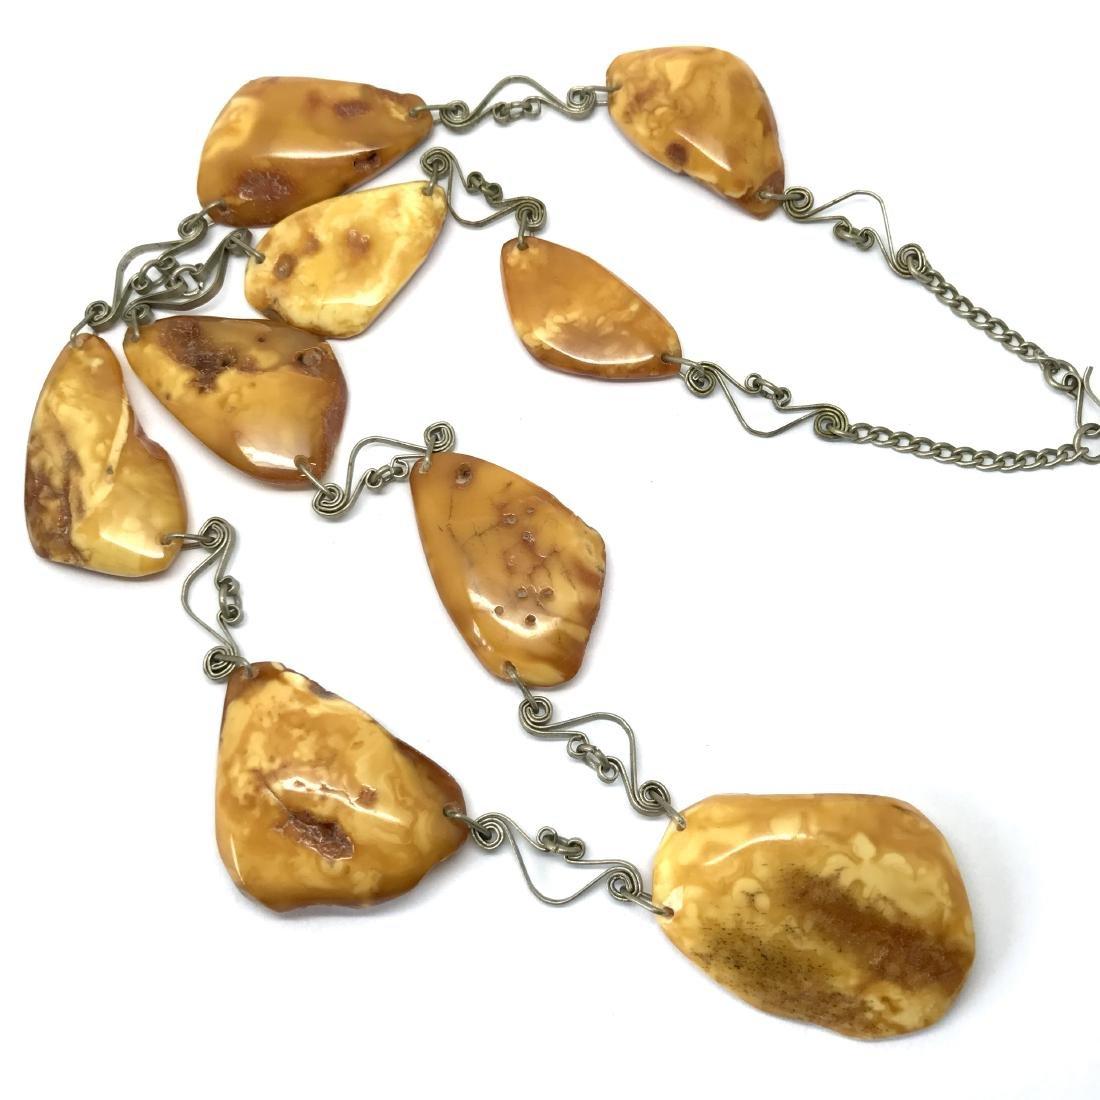 Antique white Baltic amber collar necklace 65cm 40.8 gr - 6